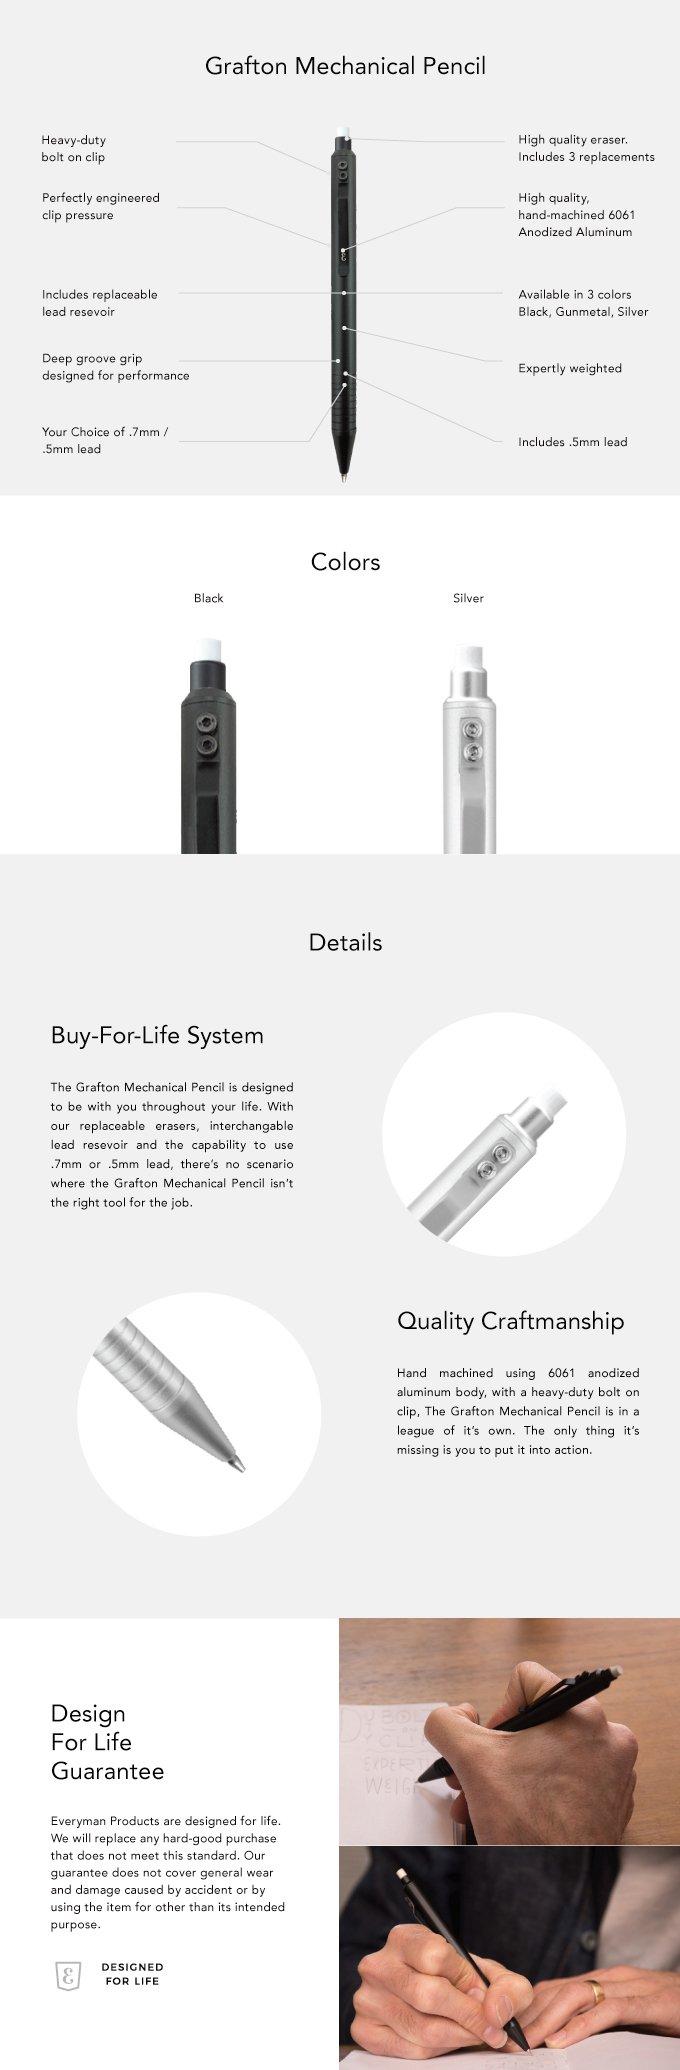 Everyman Grafton Mechanical Pencil